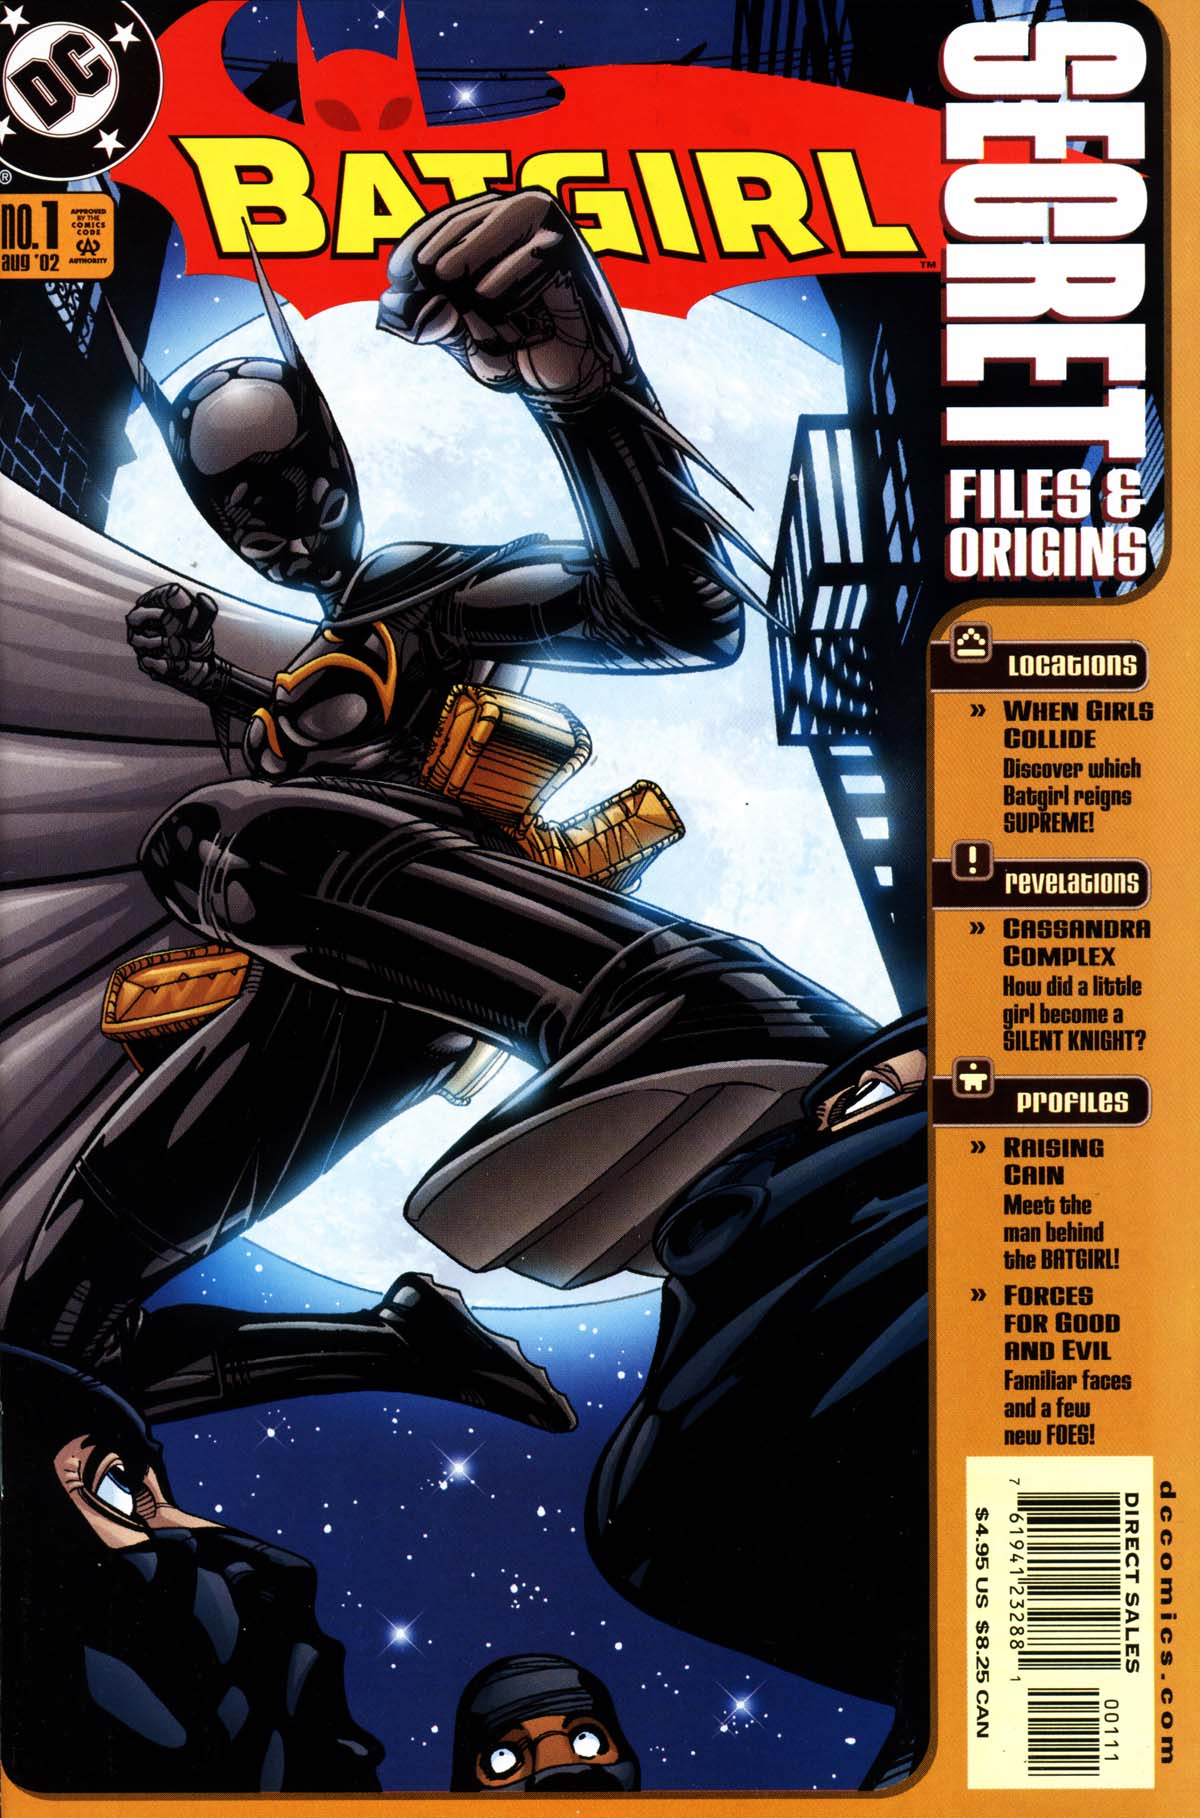 Batgirl Secret Files and Origins Full Page 1